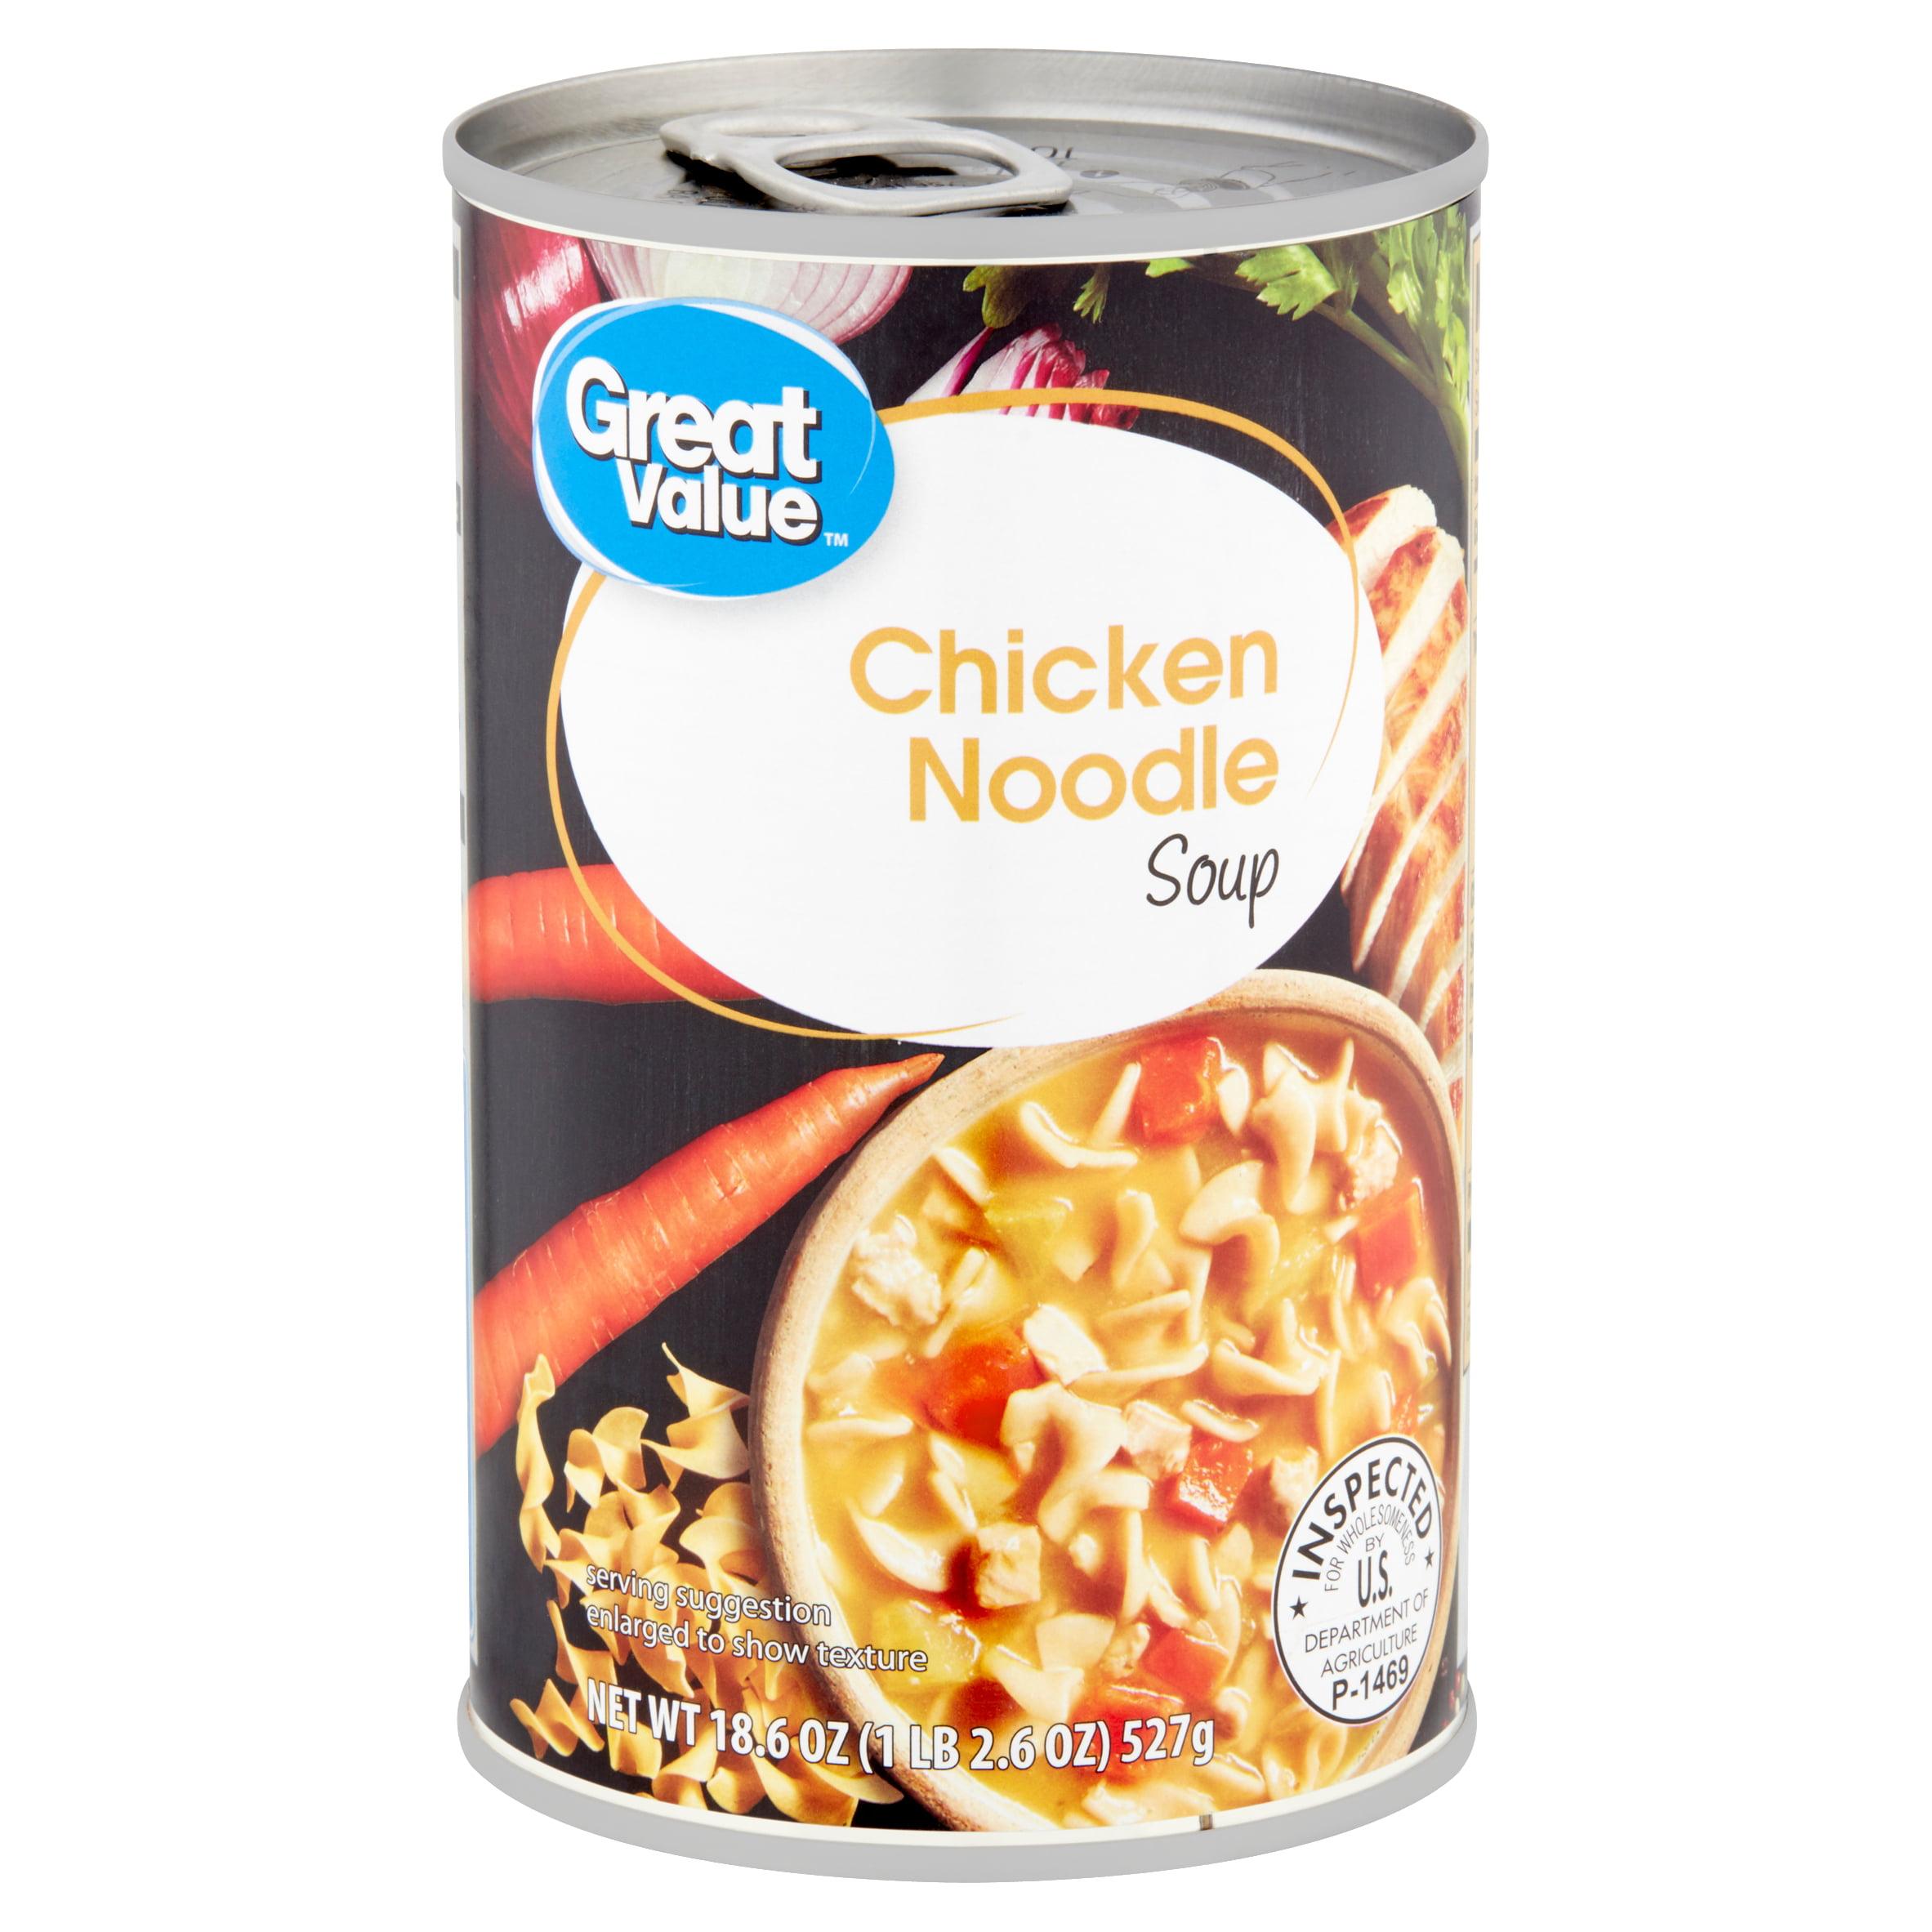 Great Value Chicken Noodle Soup, 18.6 oz